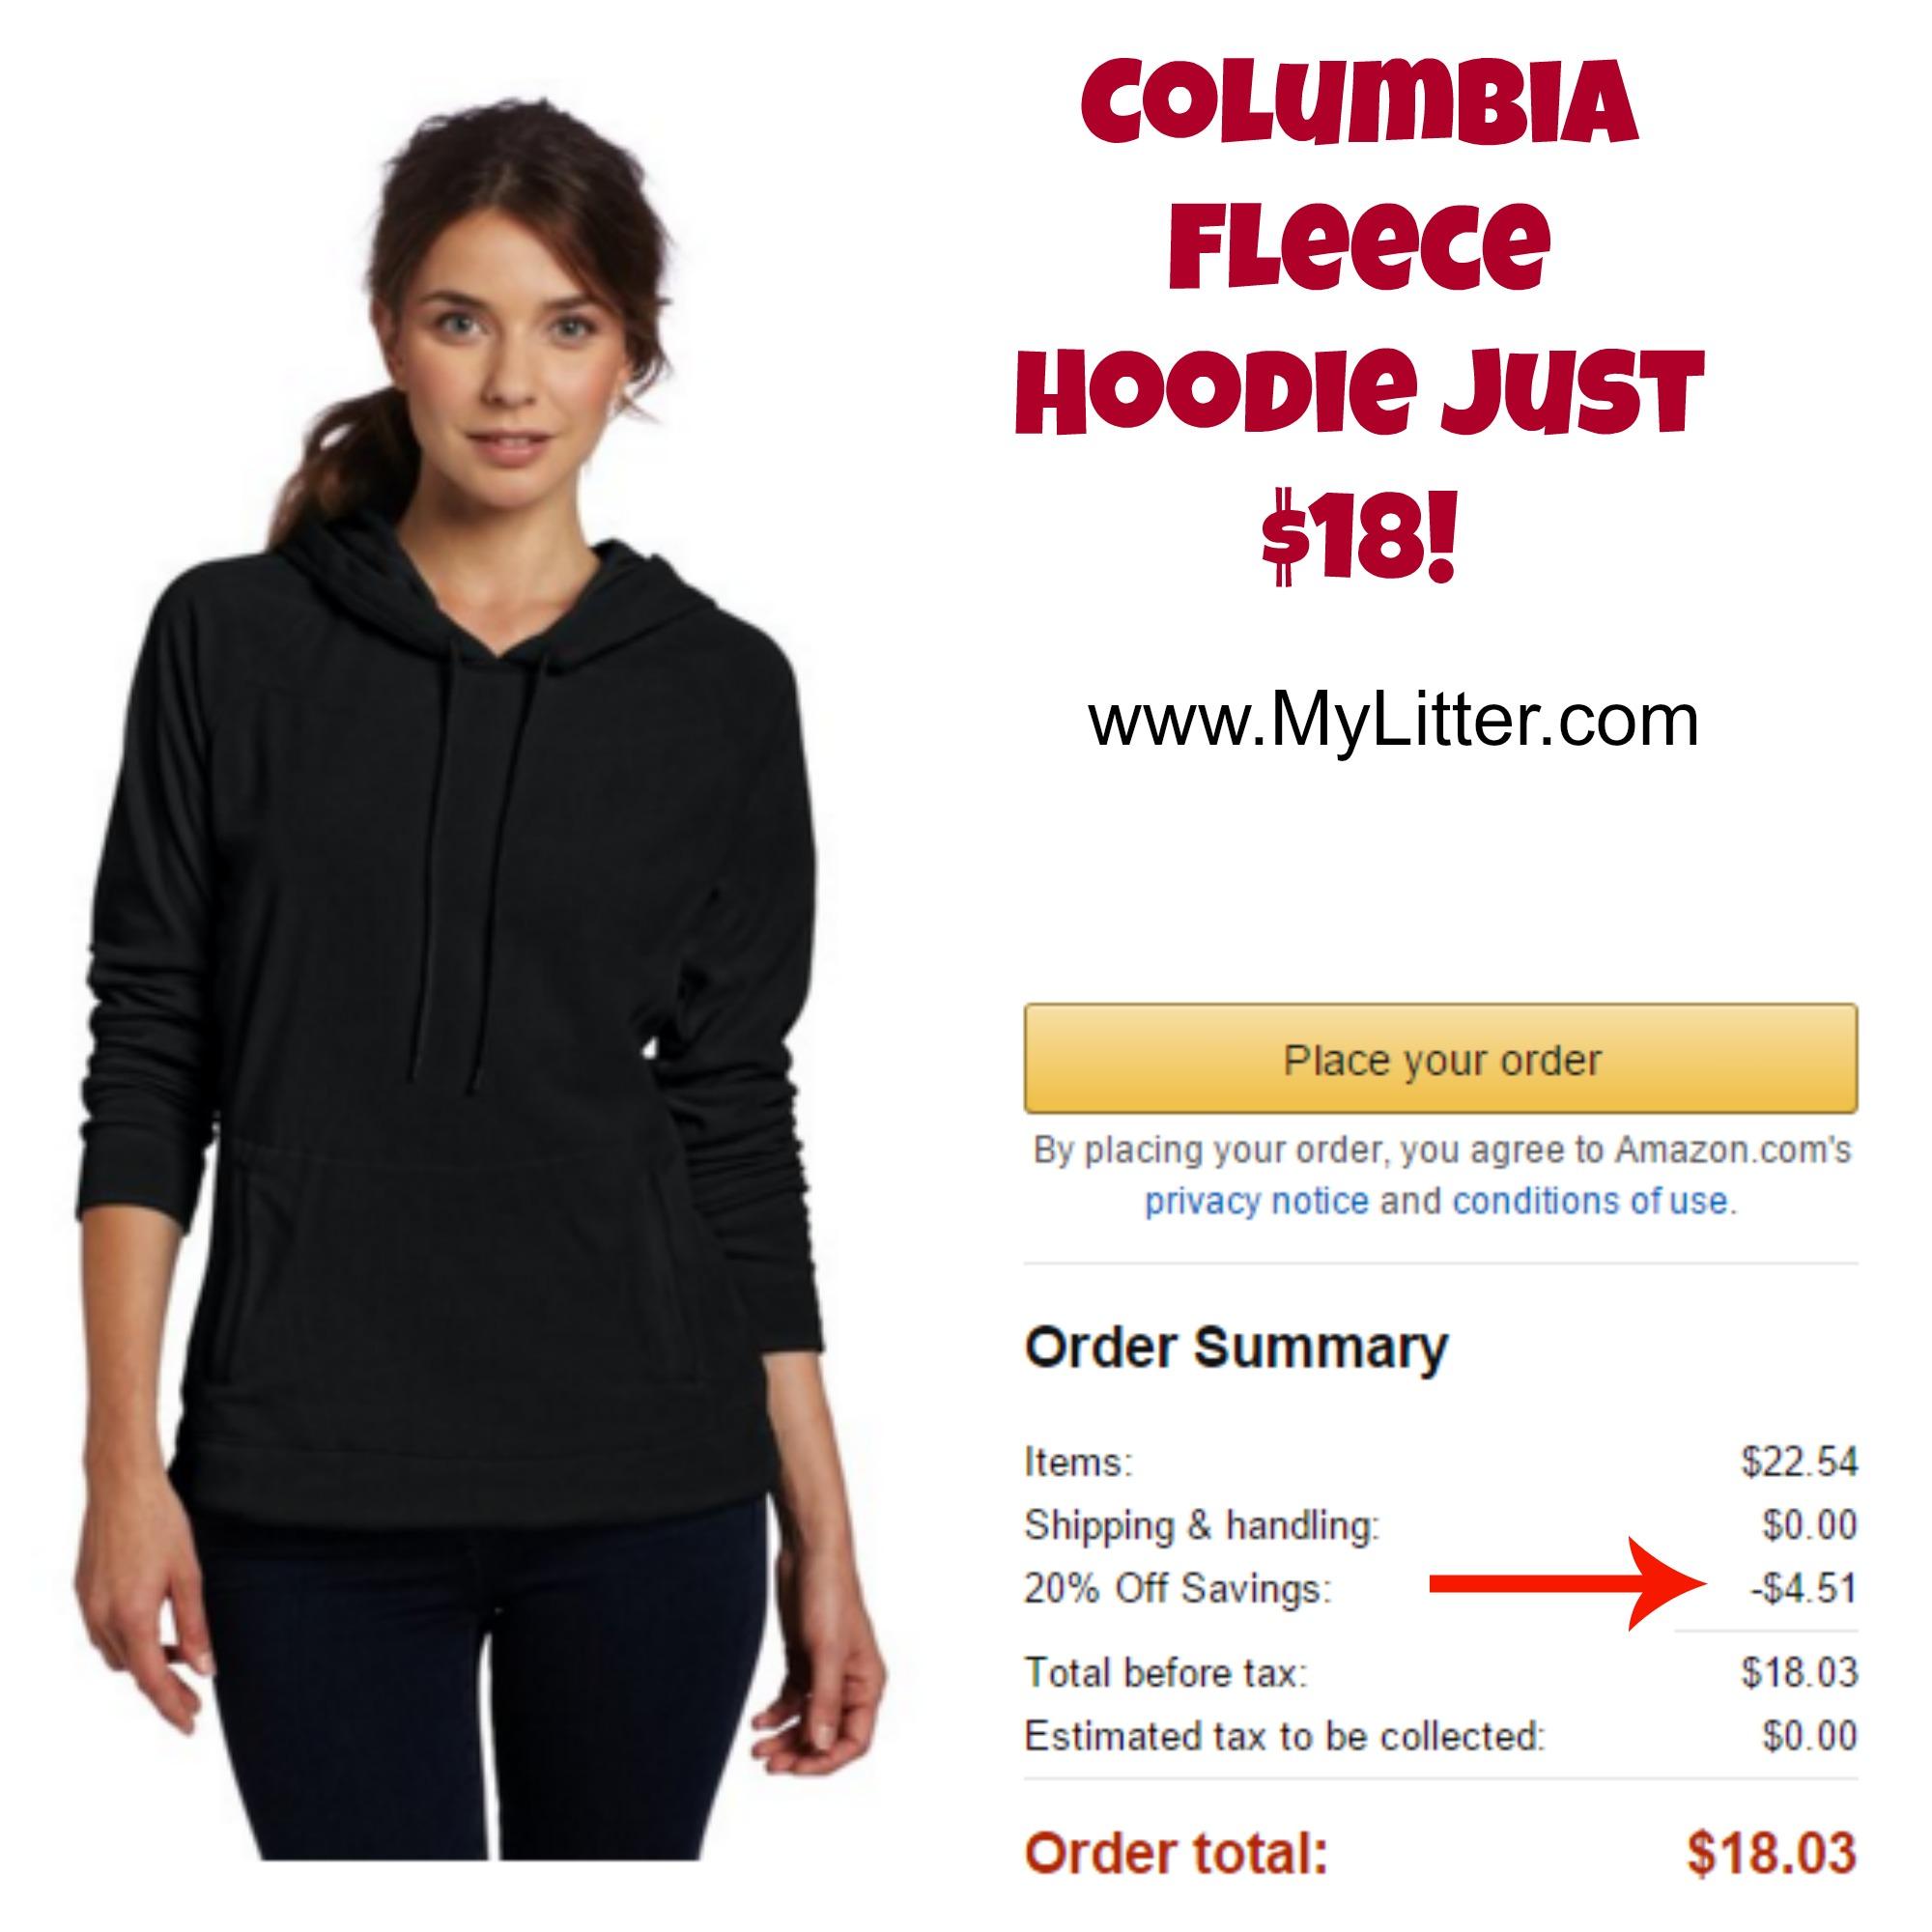 Columbia fleece coupon codes